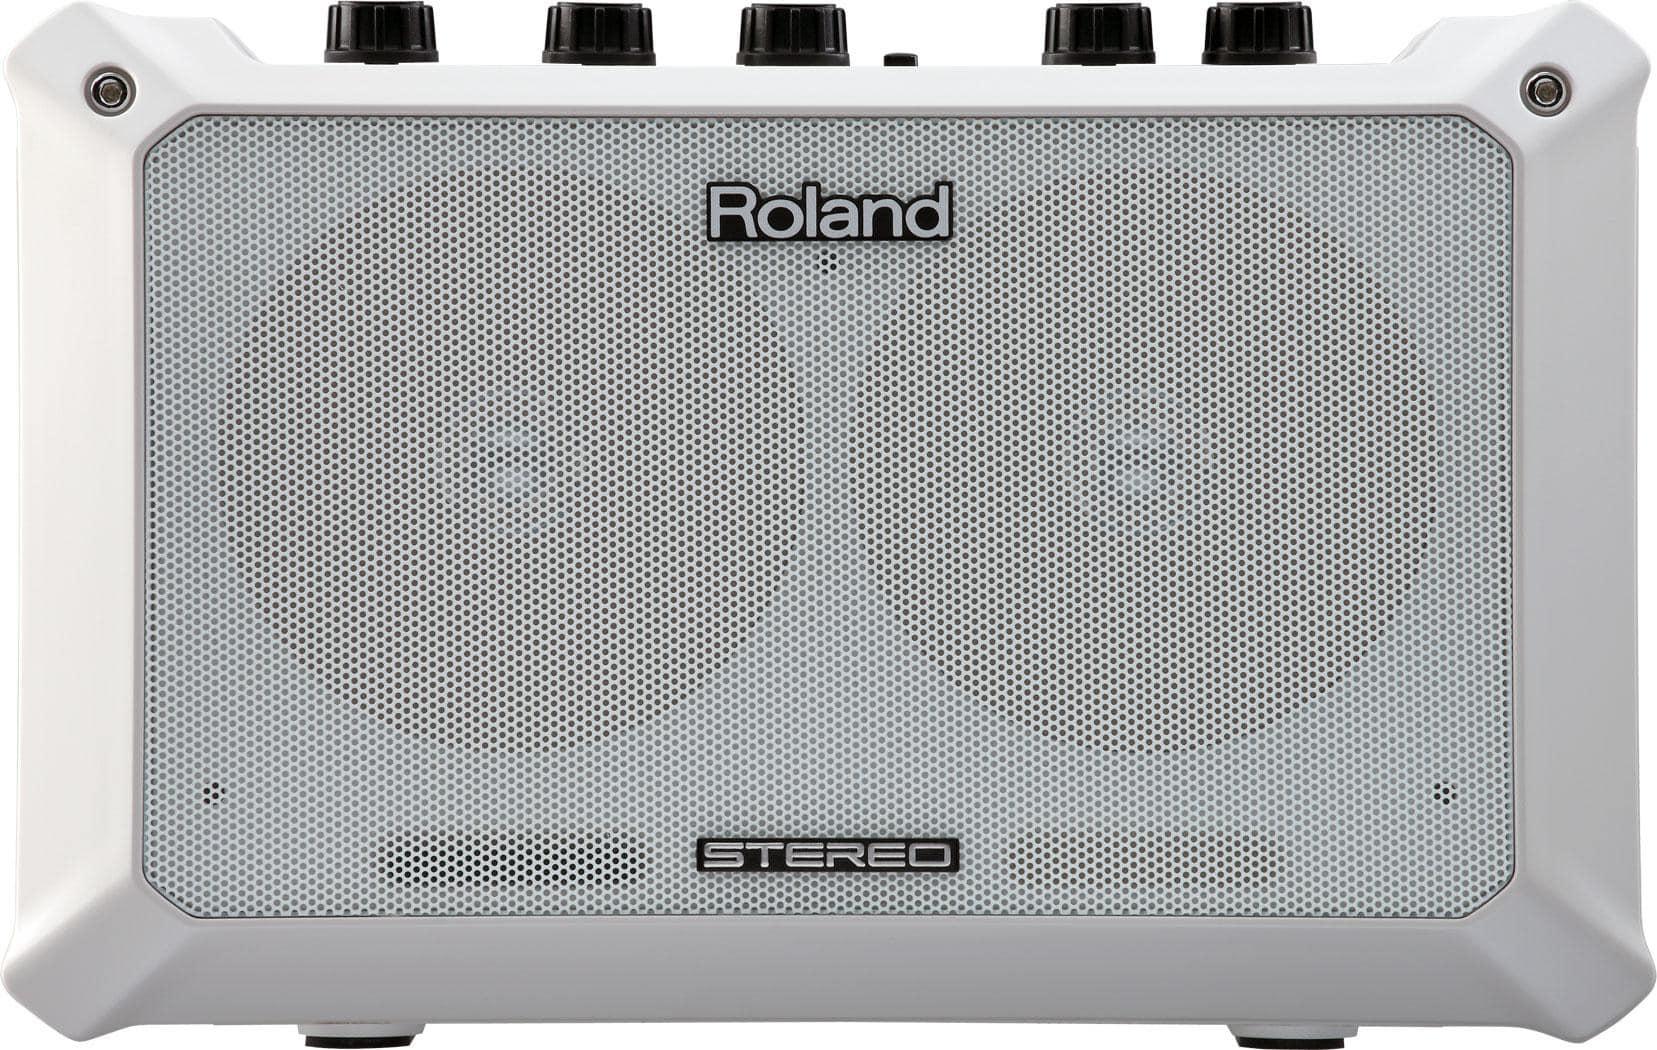 Paboxen - Roland Mobile BA Batterie Verstärker - Onlineshop Musikhaus Kirstein